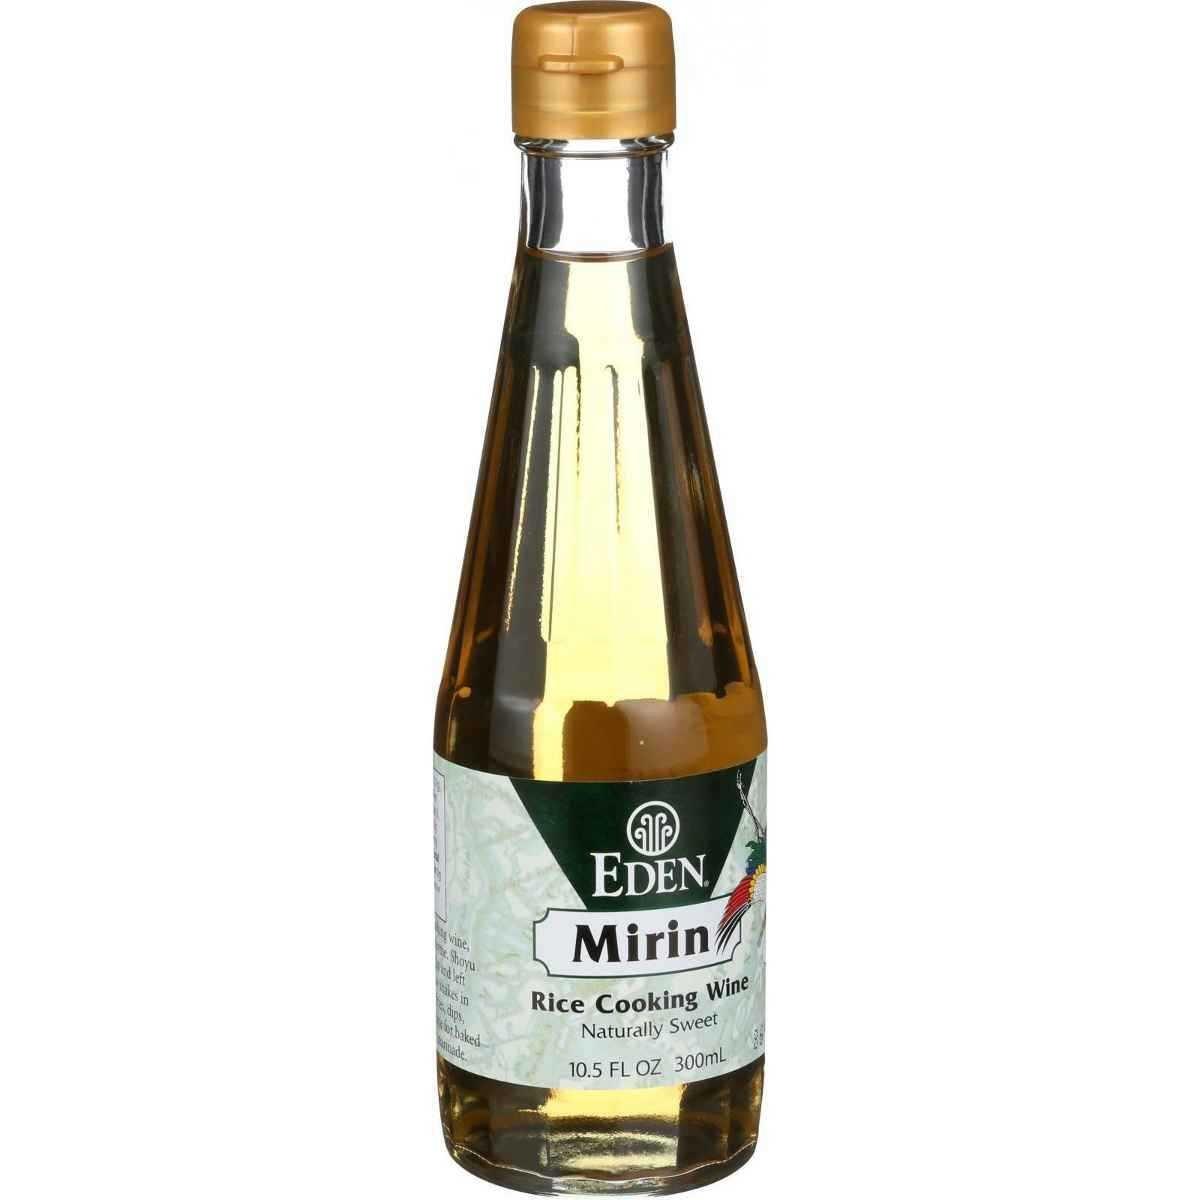 Eden Foods Mirin - Rice Cooking Wine - 10.5 oz - Case of 3